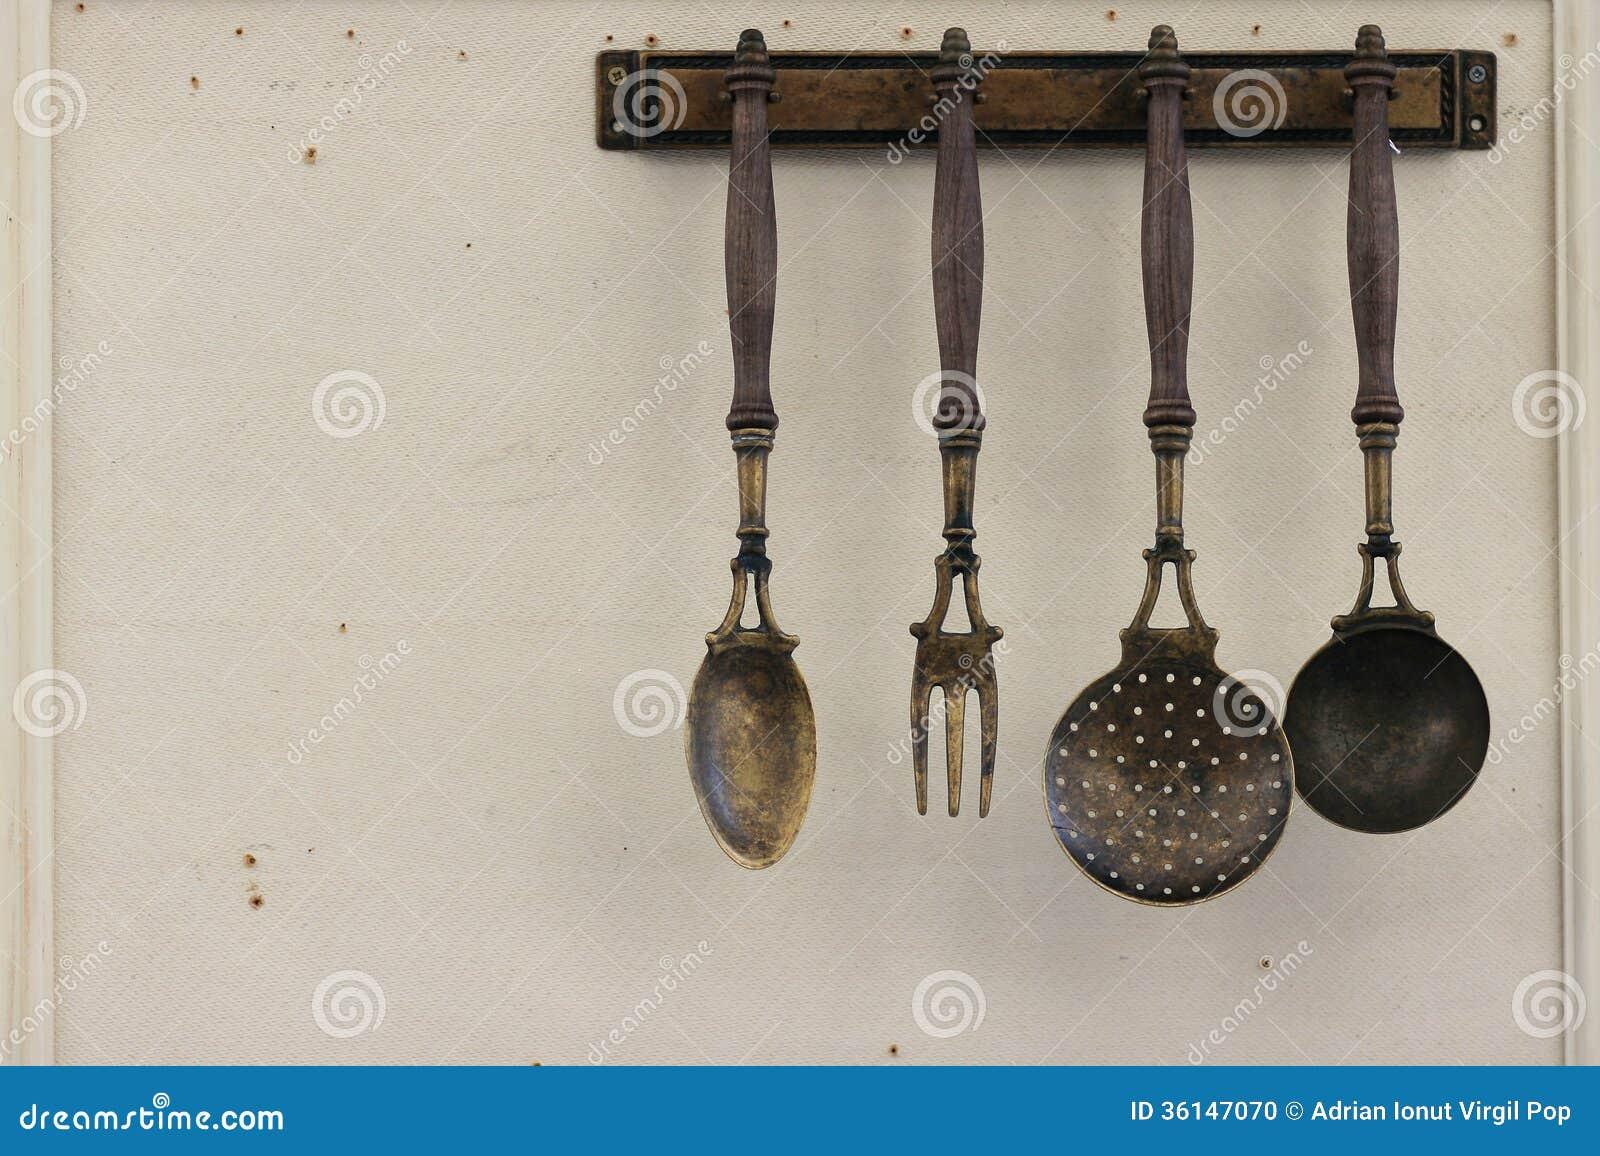 Hanging Cooking Utensils Clipart